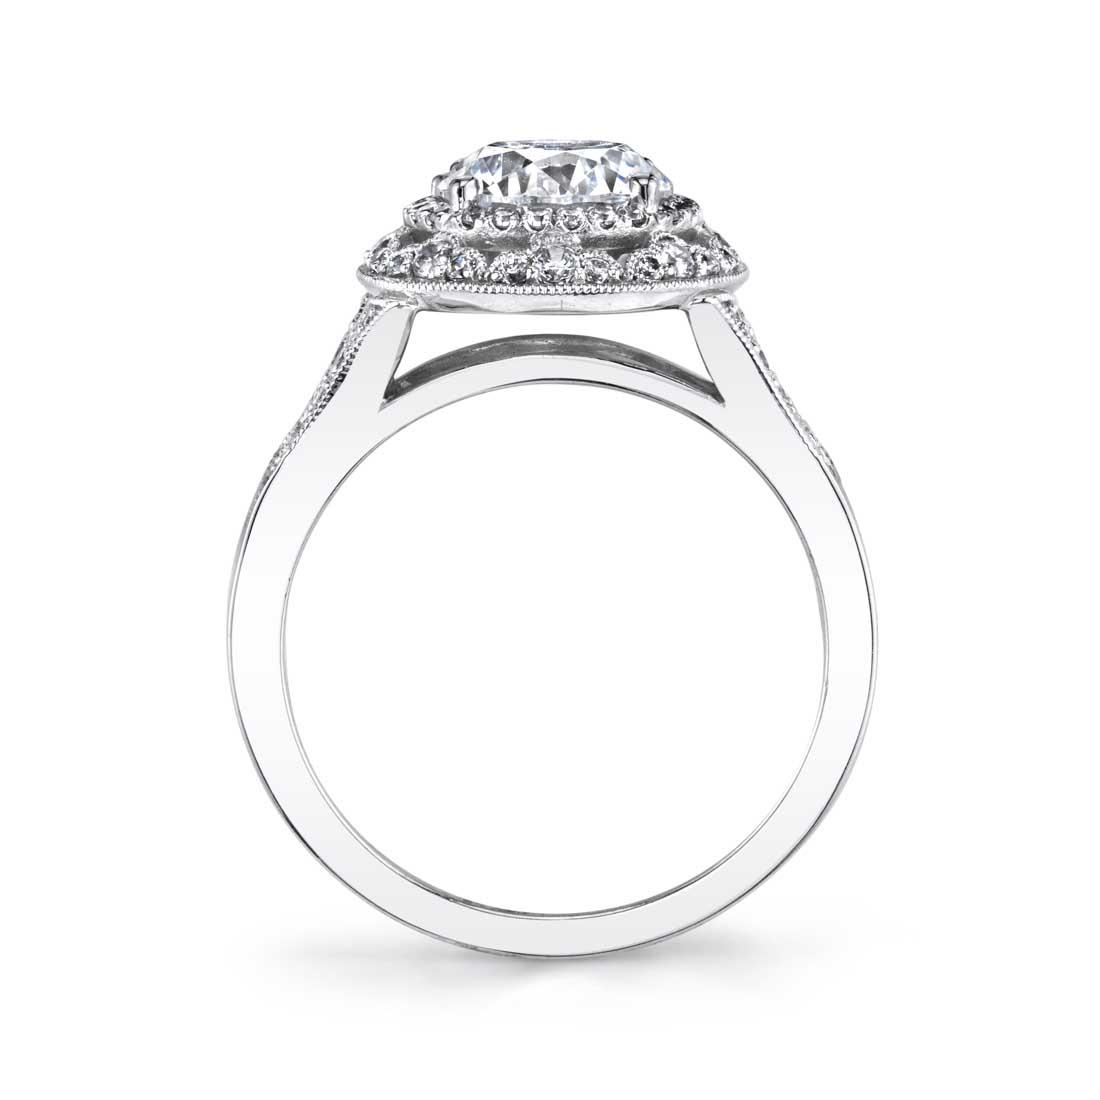 Cheri Vintage Inspired Halo Engagement Ring: Jade - Vintage Inspired Engagement Ring